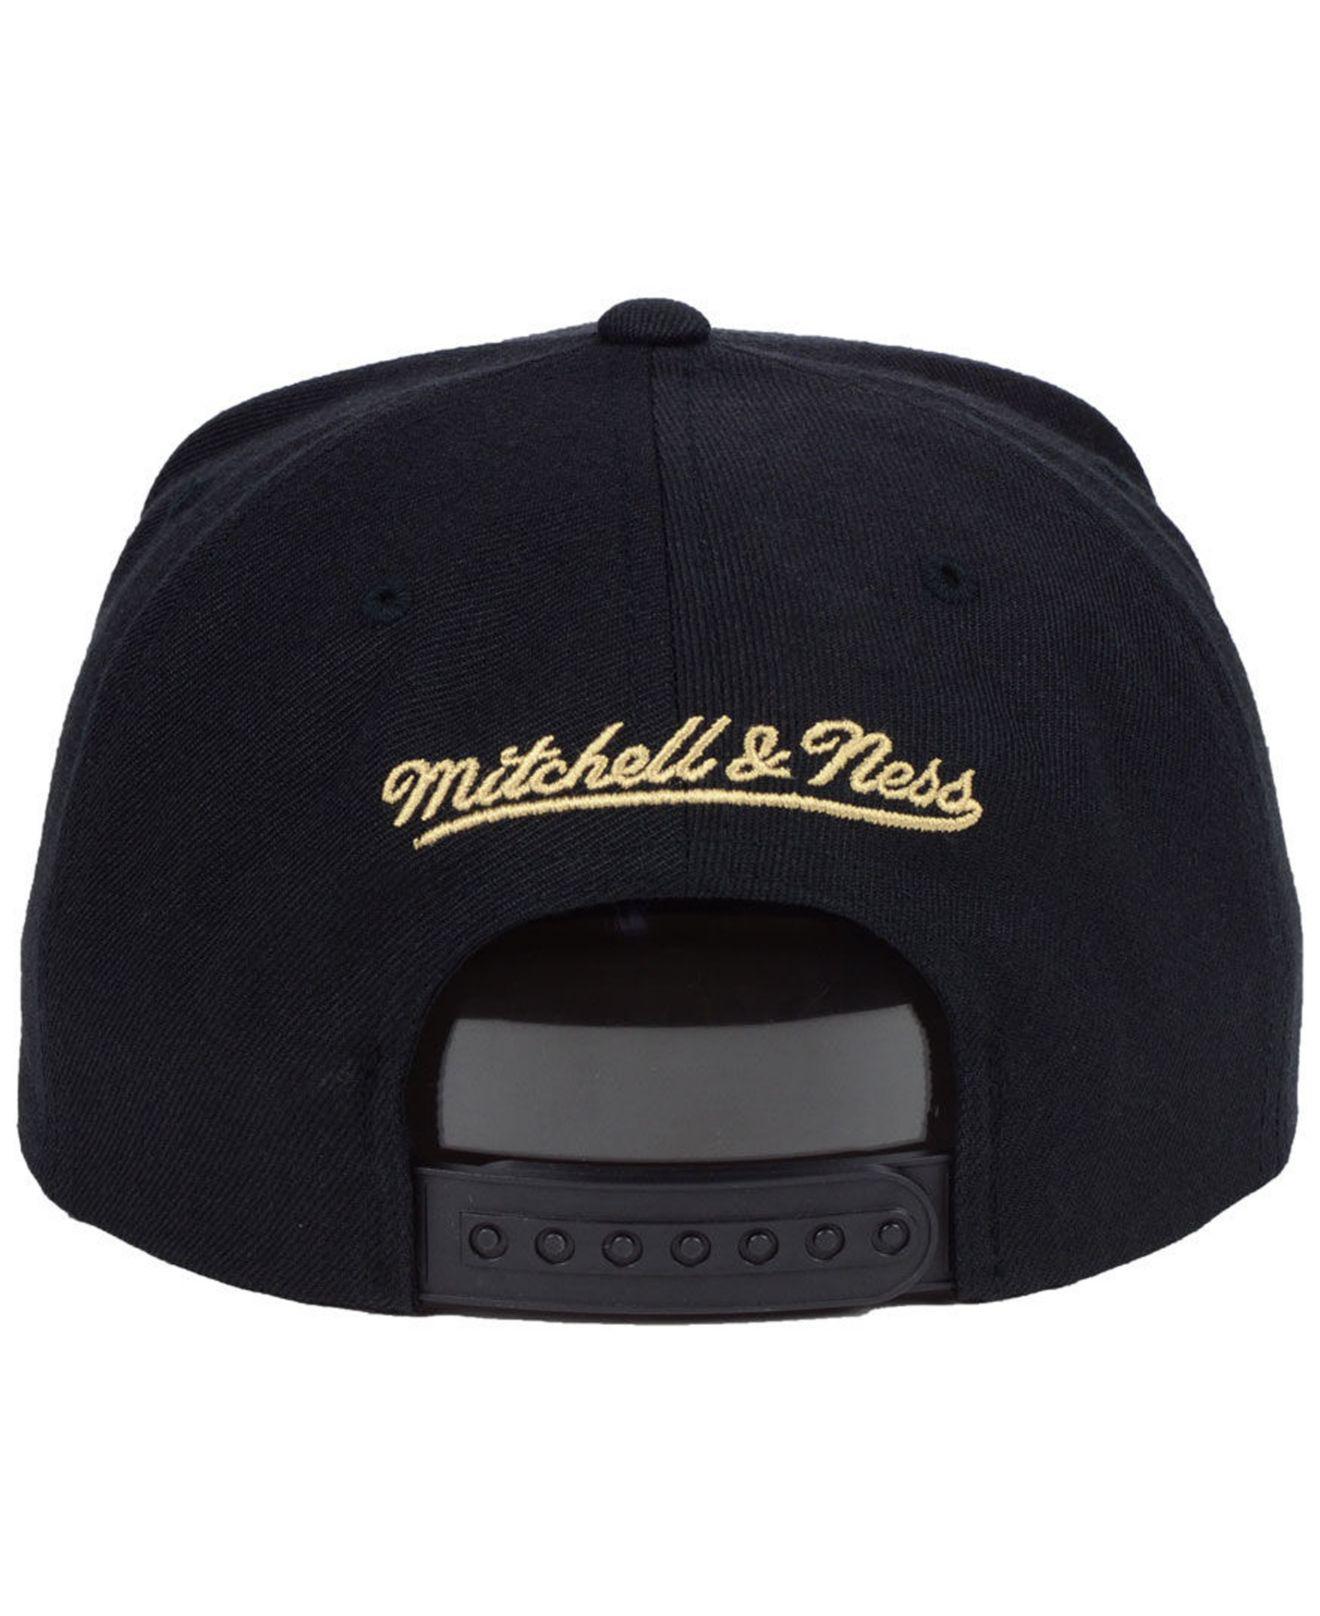 ... discount code for mitchell ness black sacramento kings natural camo  snapback cap for men lyst. 324b44d89e16